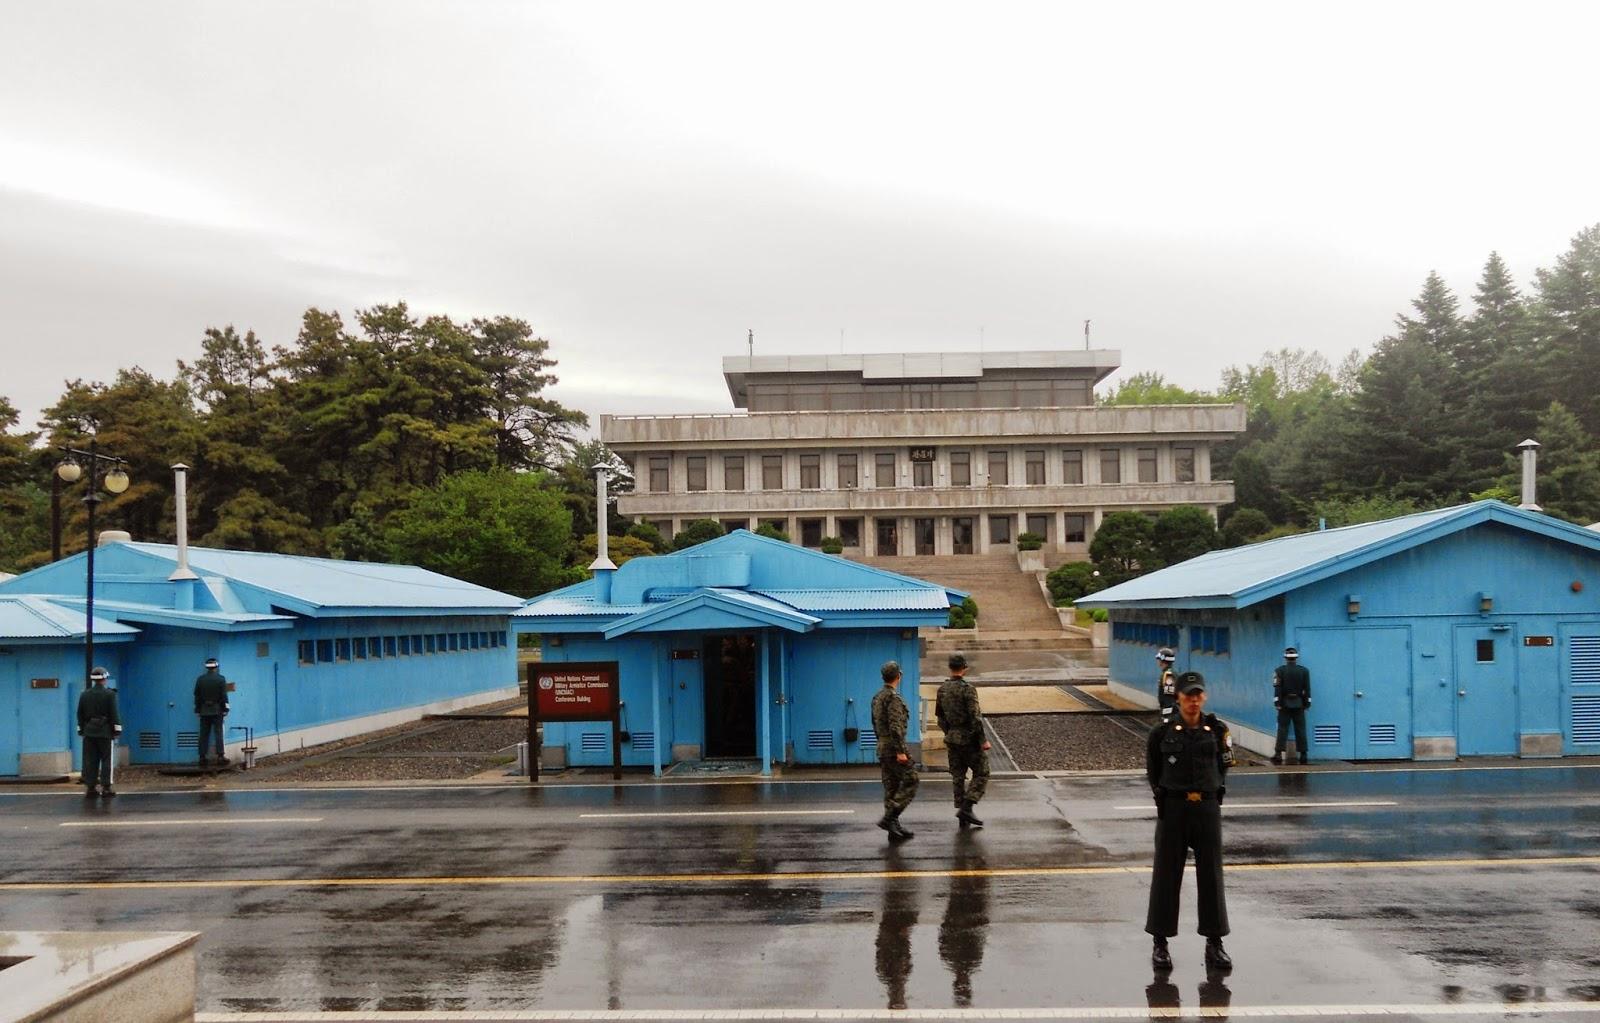 DMZ, north Korea, south Korea, photograph, photo, border, soldiers, 2014, army